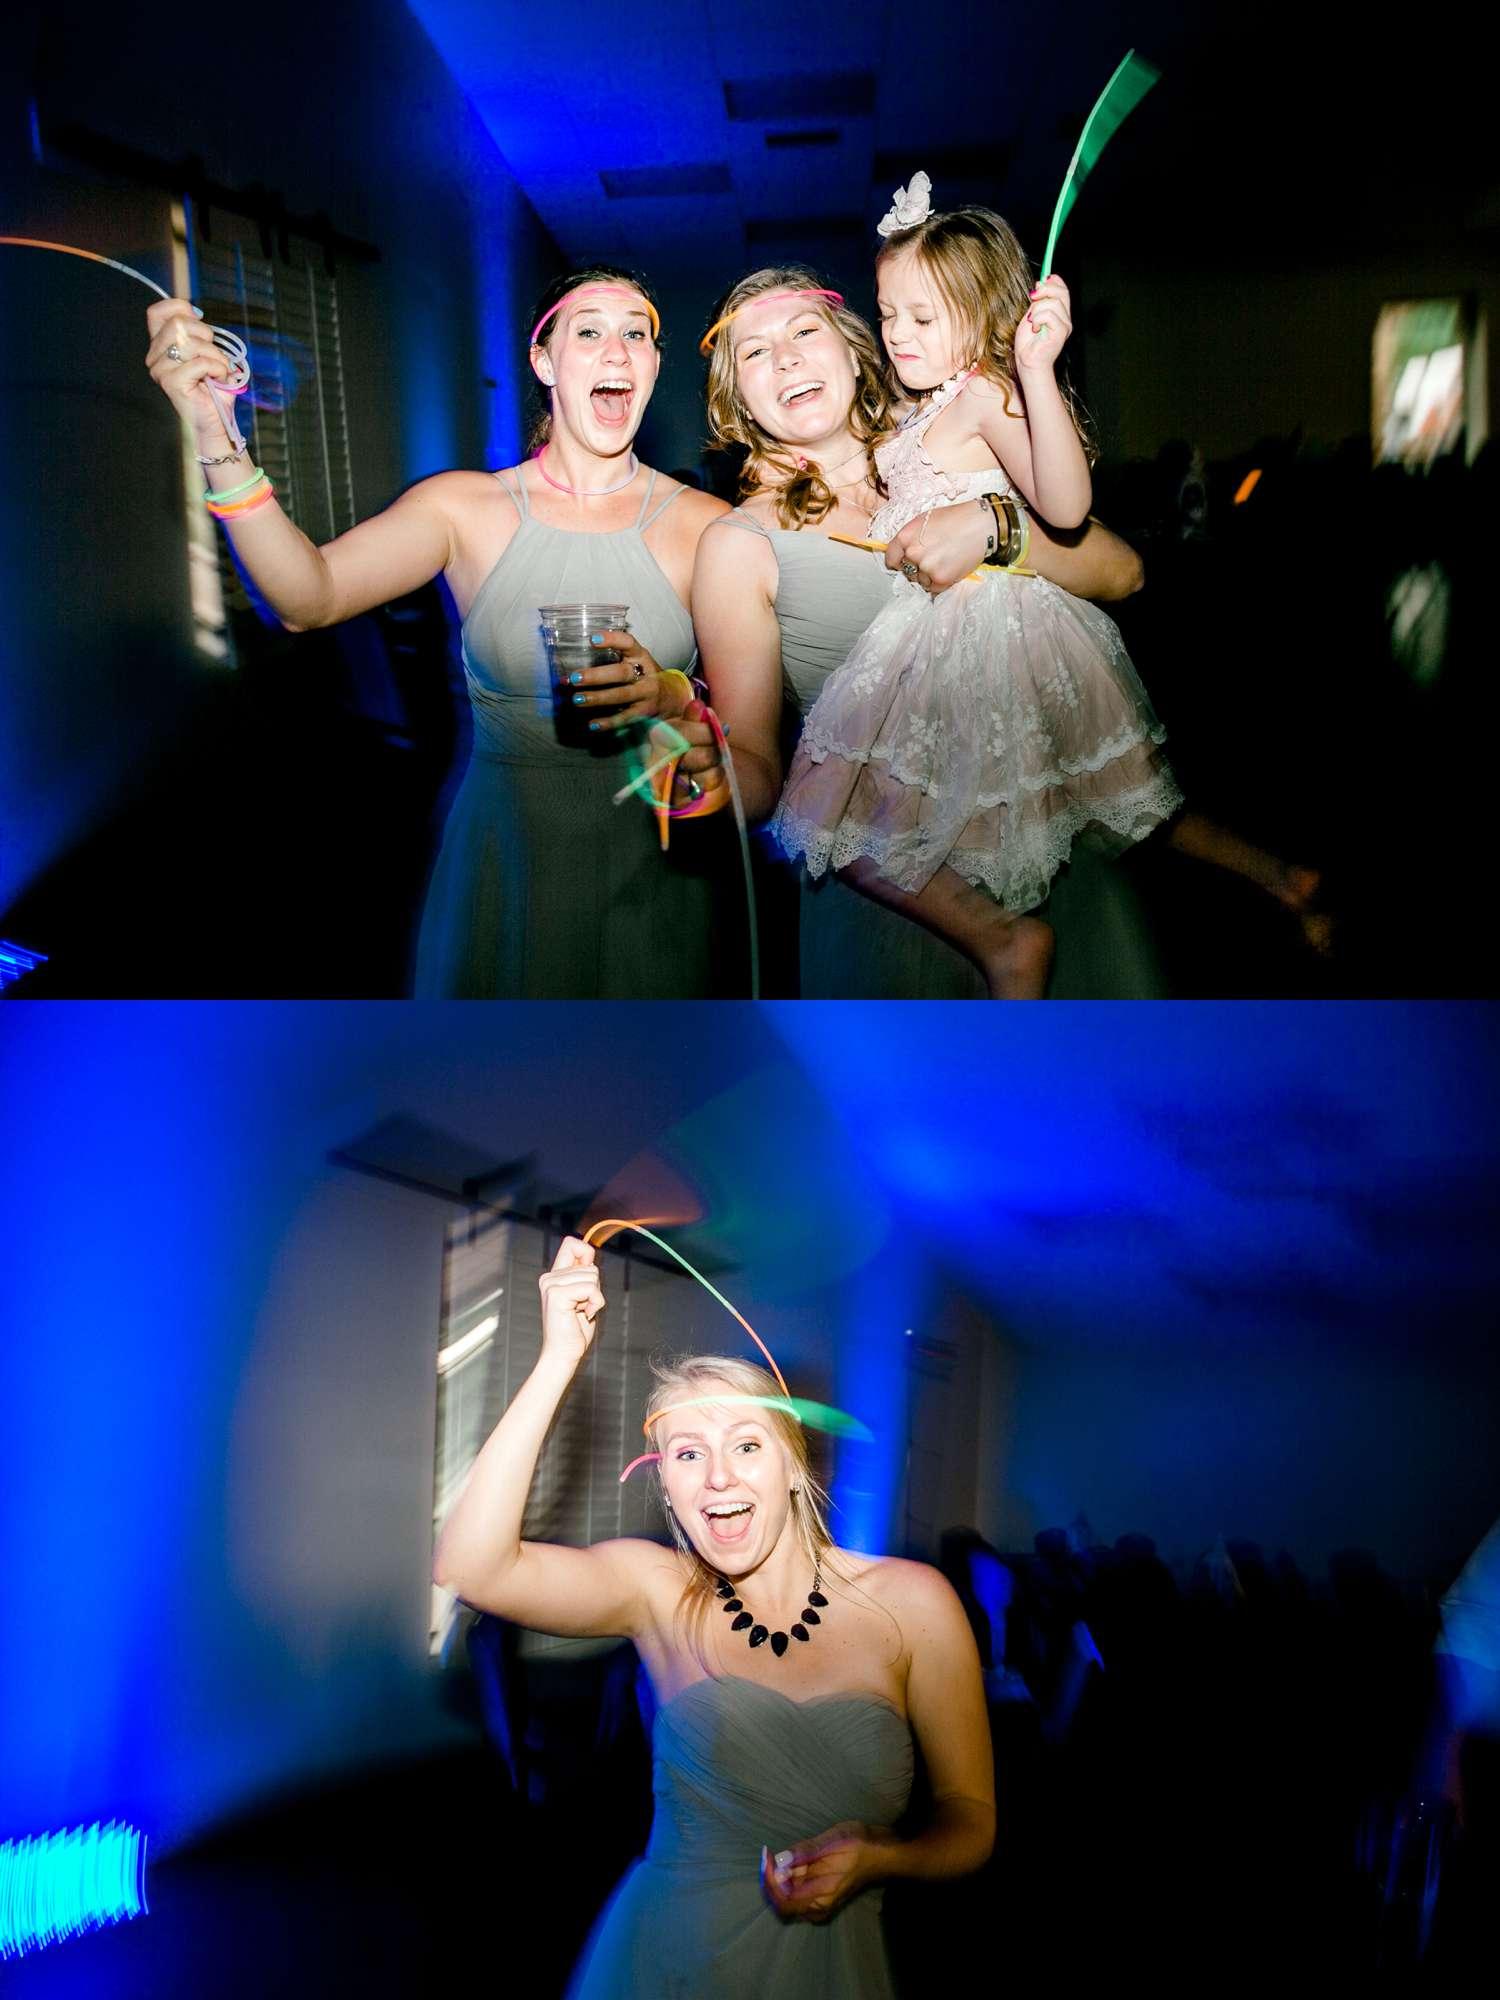 TY+NATHAN+HALLIER+ALLEEJ+WEDDING+PHOTOGRAPHER+RANSOM+CANYON_0133.jpg